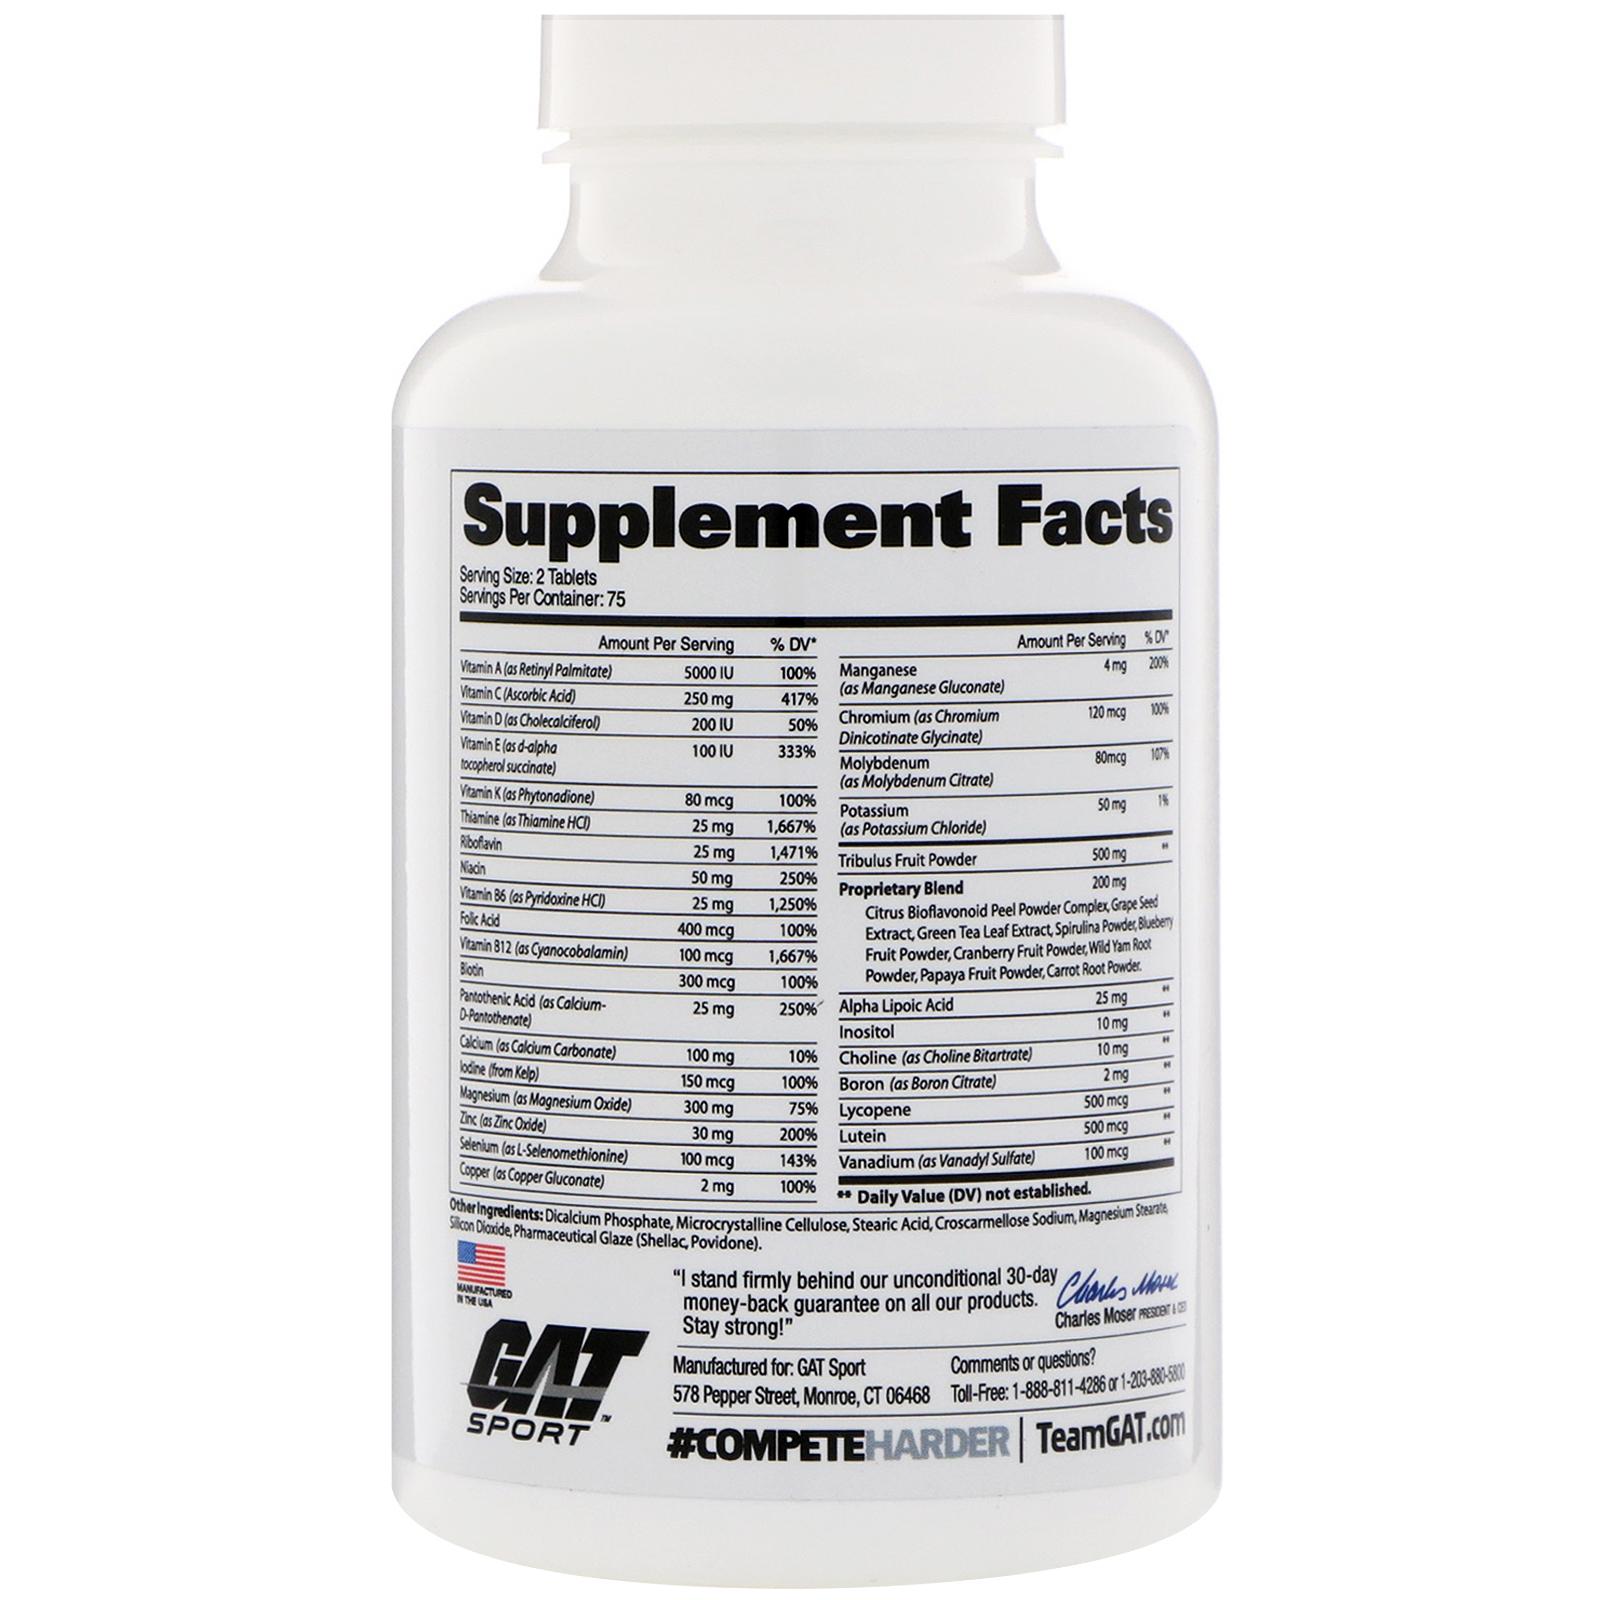 5c54865ba09a52 GAT, Multivitaminas + Testosterona para hombres, 150 tabletas ...